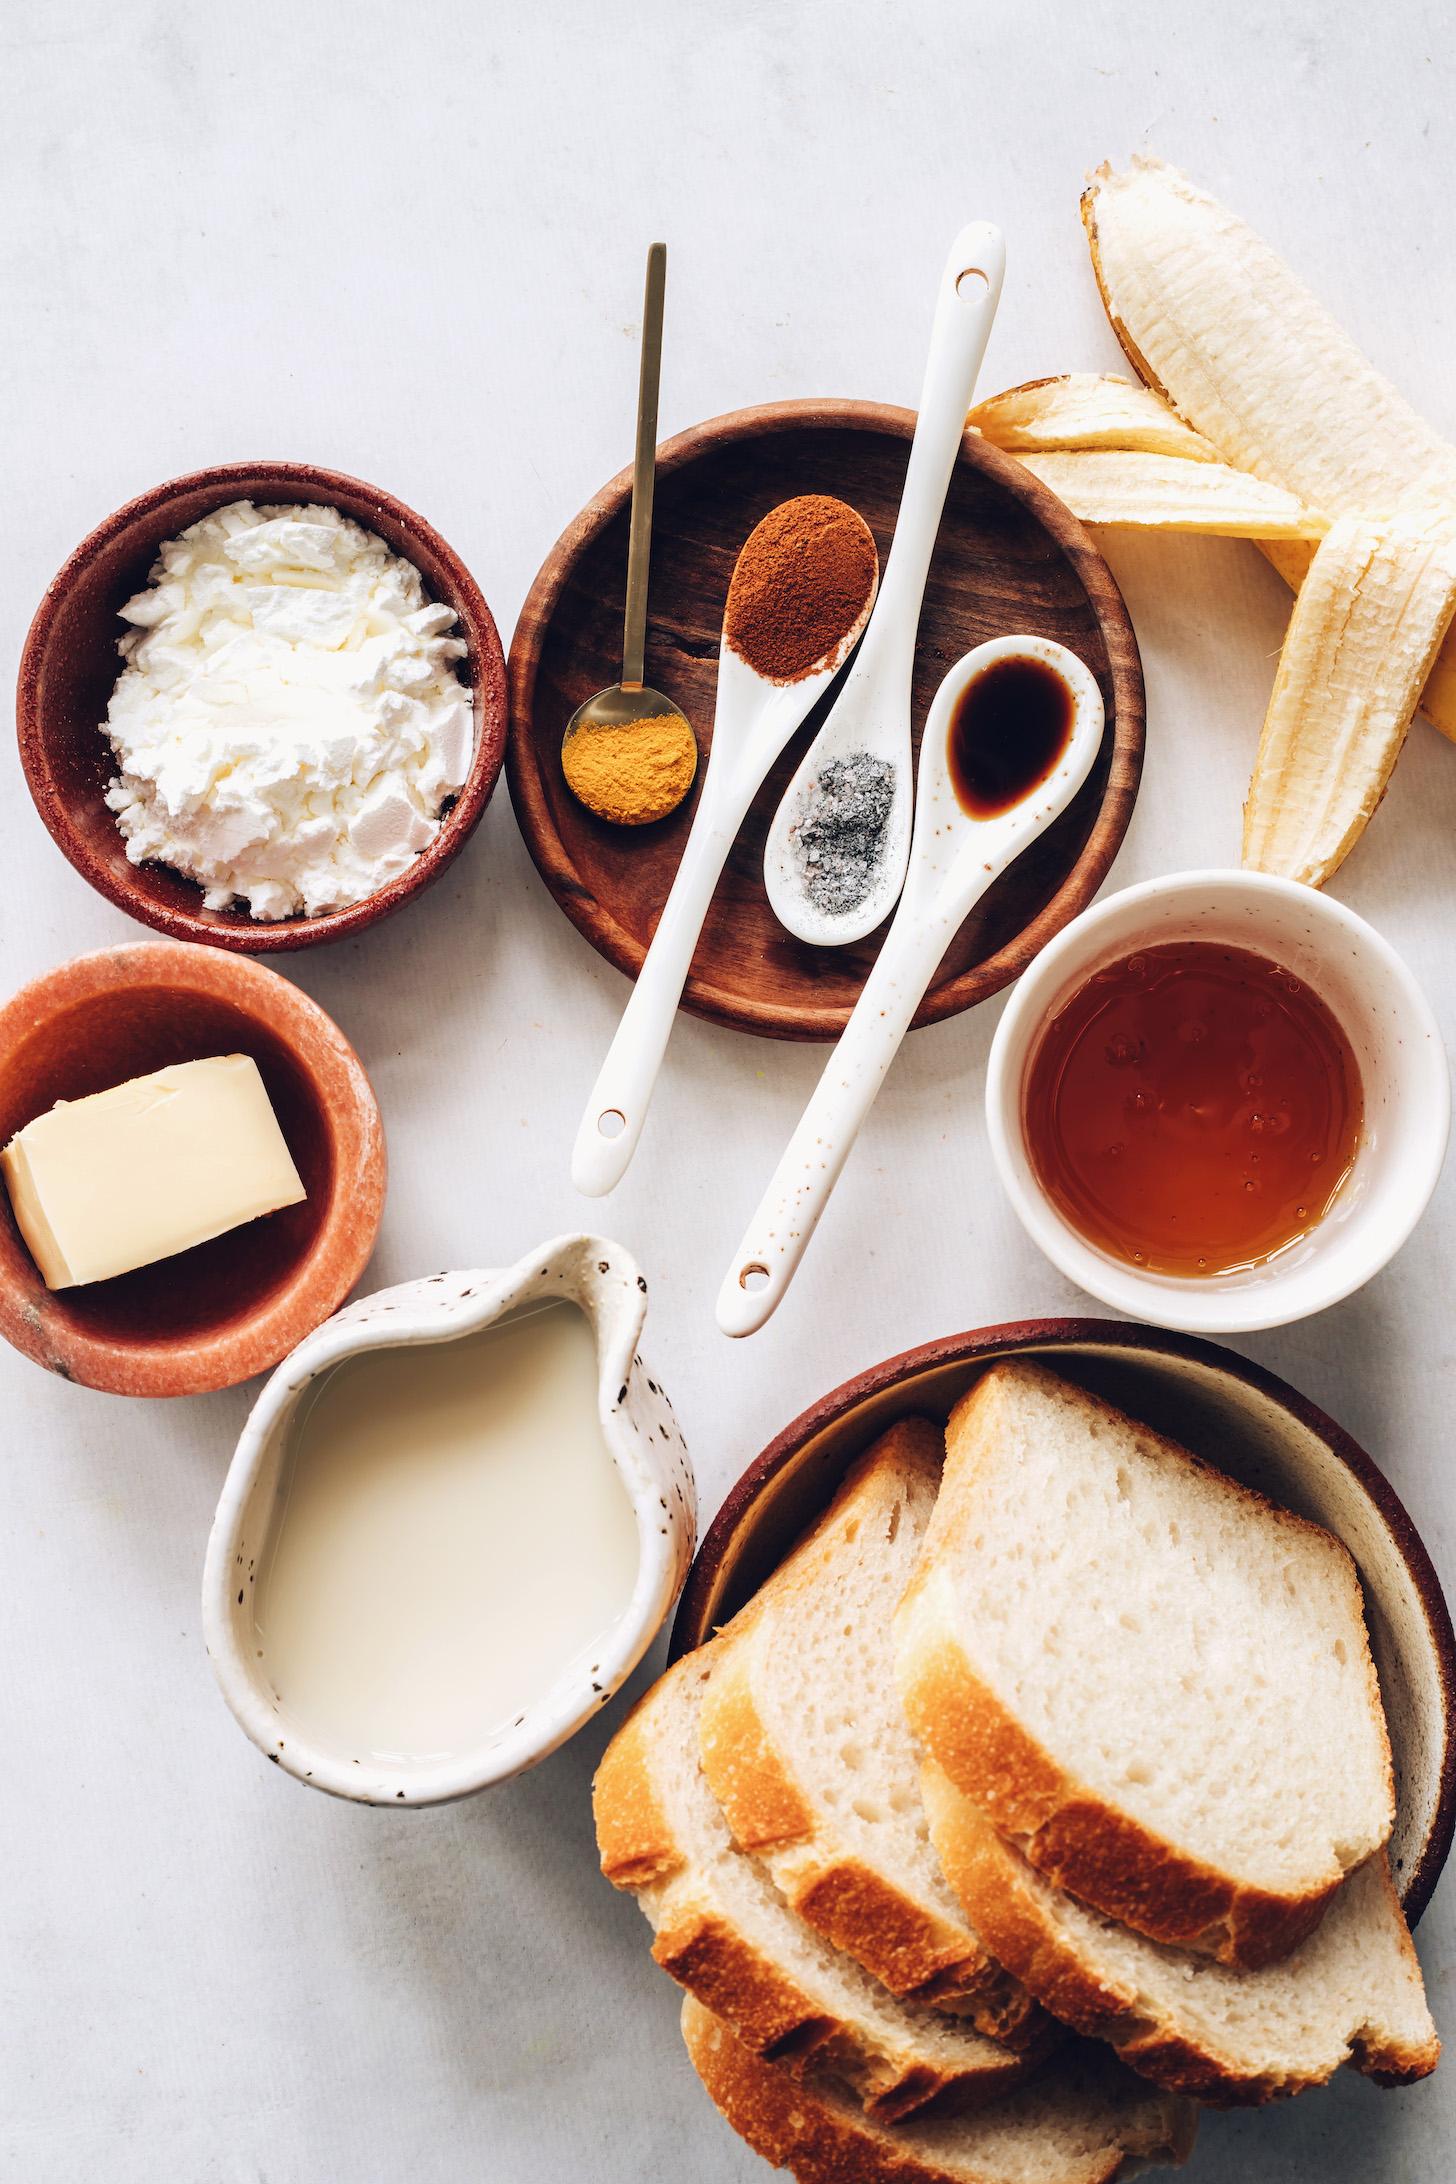 Cornstarch, vegan butter, almond milk, sourdough bread, maple syrup, banana, turmeric, cinnamon, black salt, and vanilla